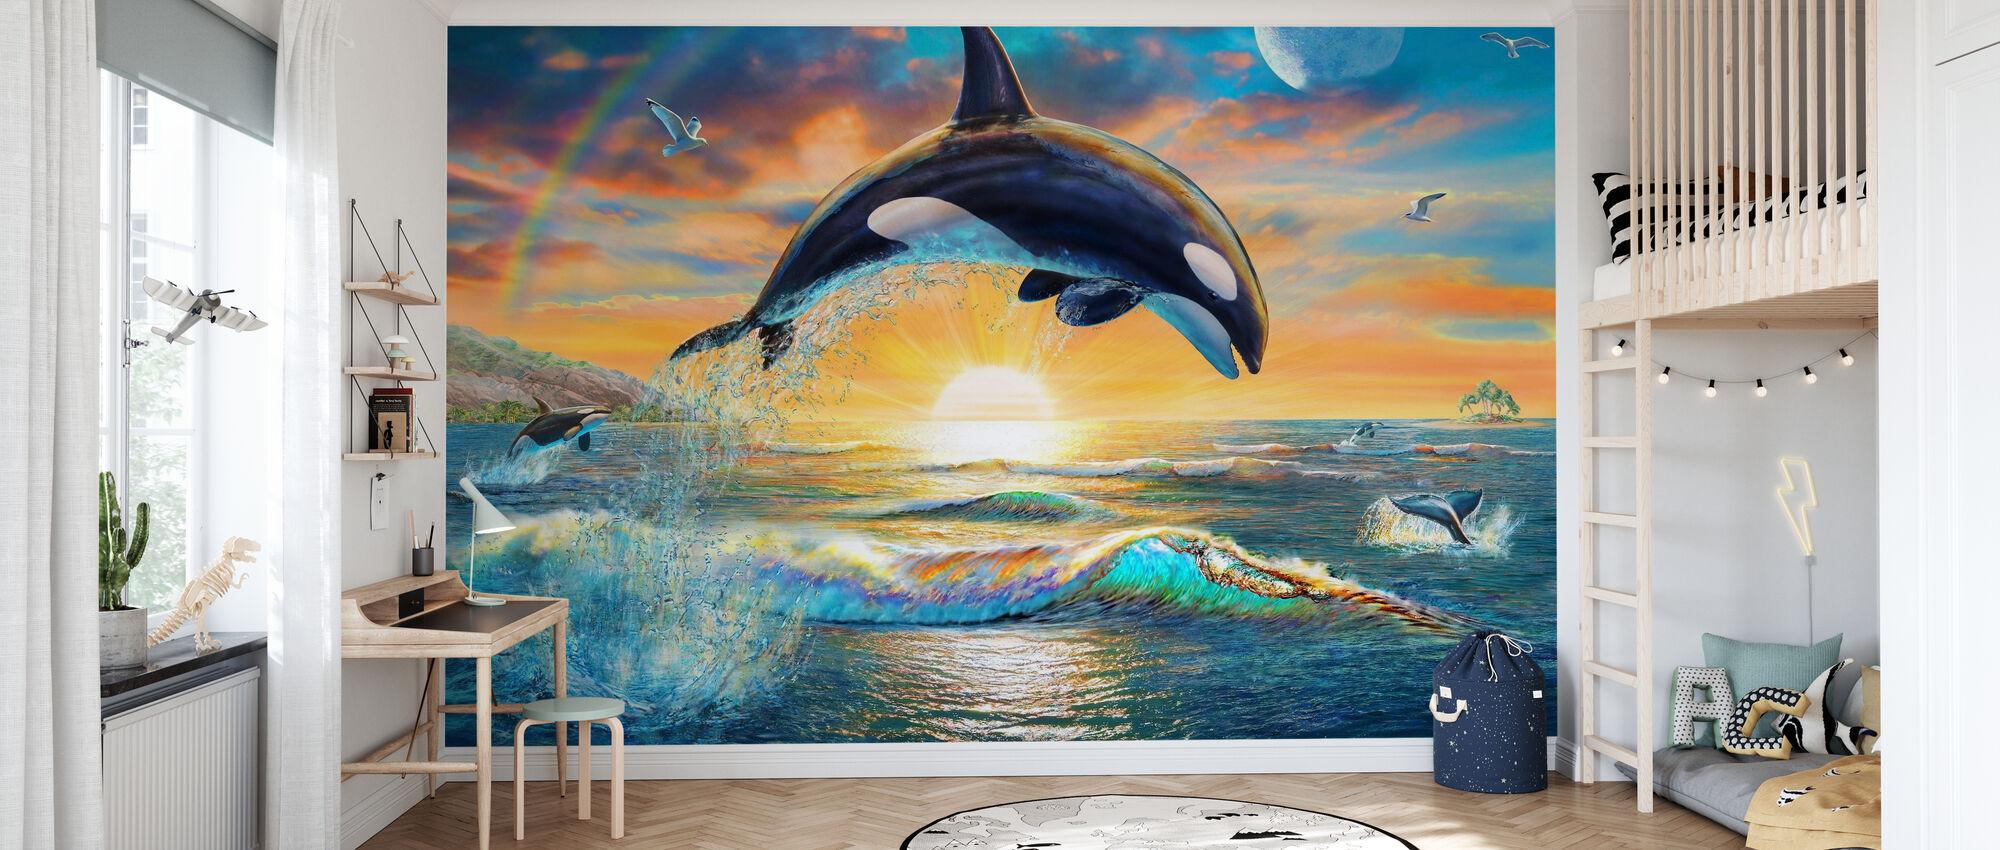 Orca Dawn - Wallpaper - Kids Room